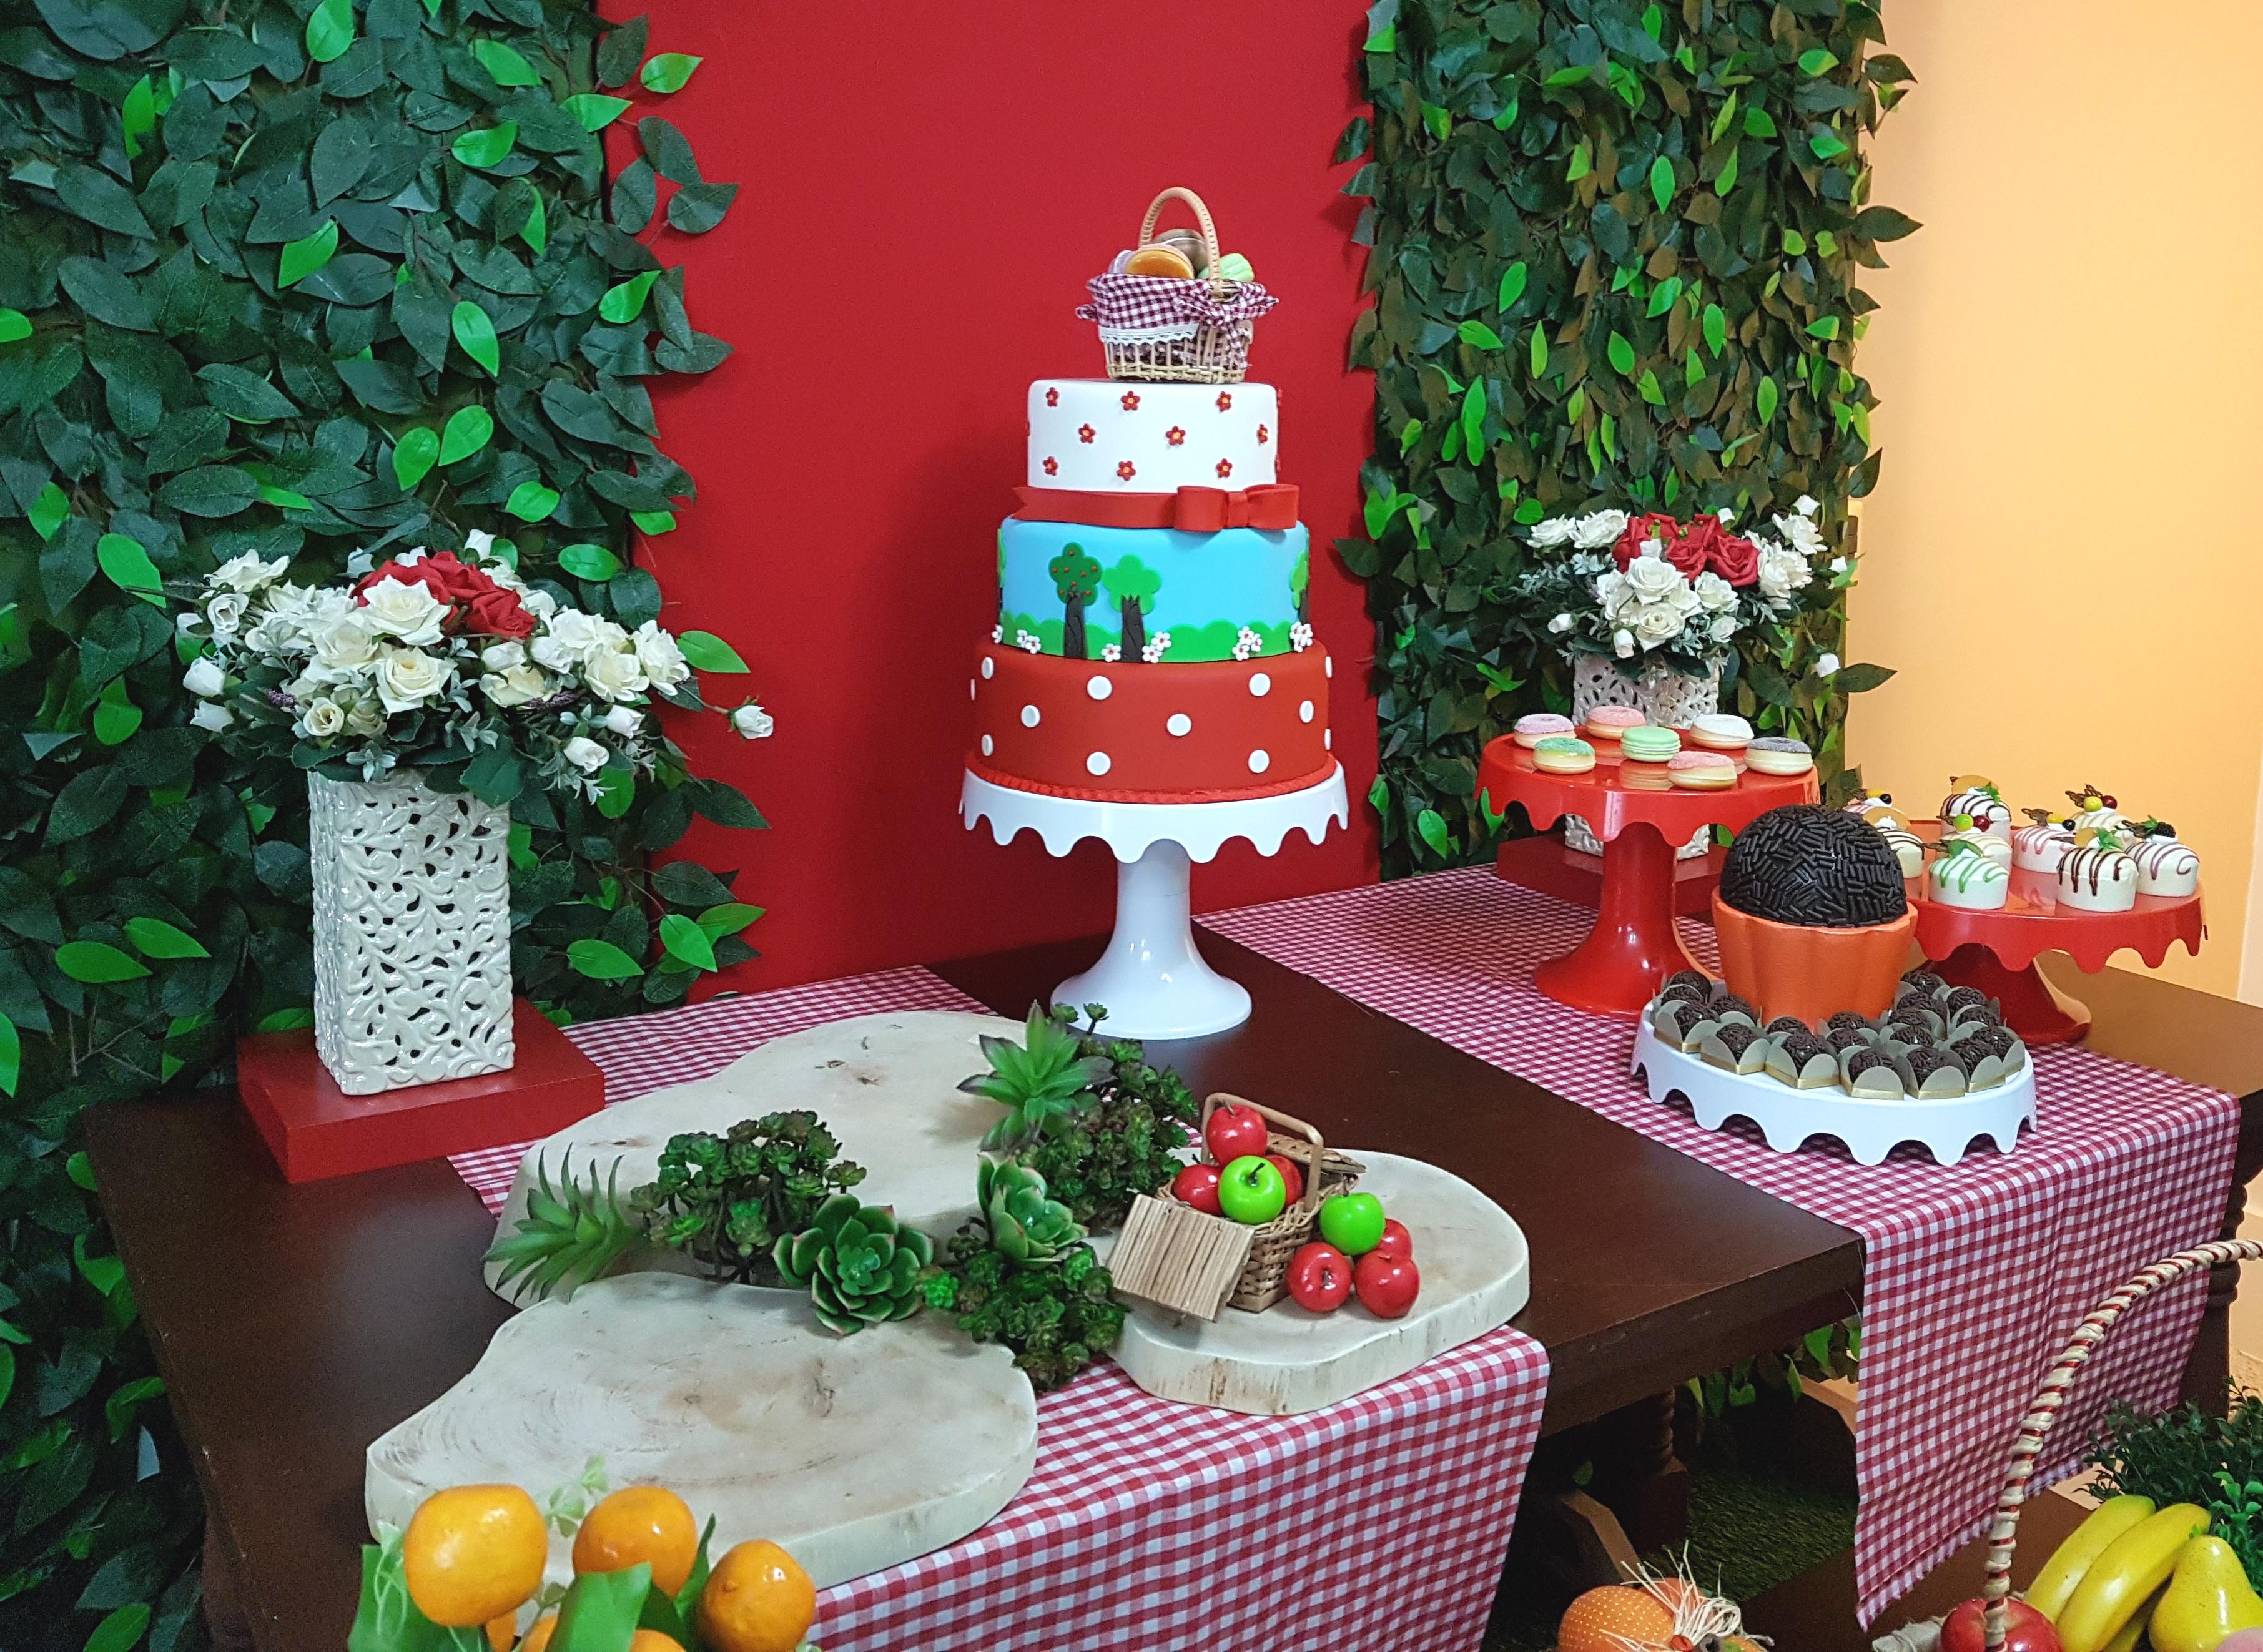 aluguel-decoracao-festa-piquenique-aluguel-festa-piquenique